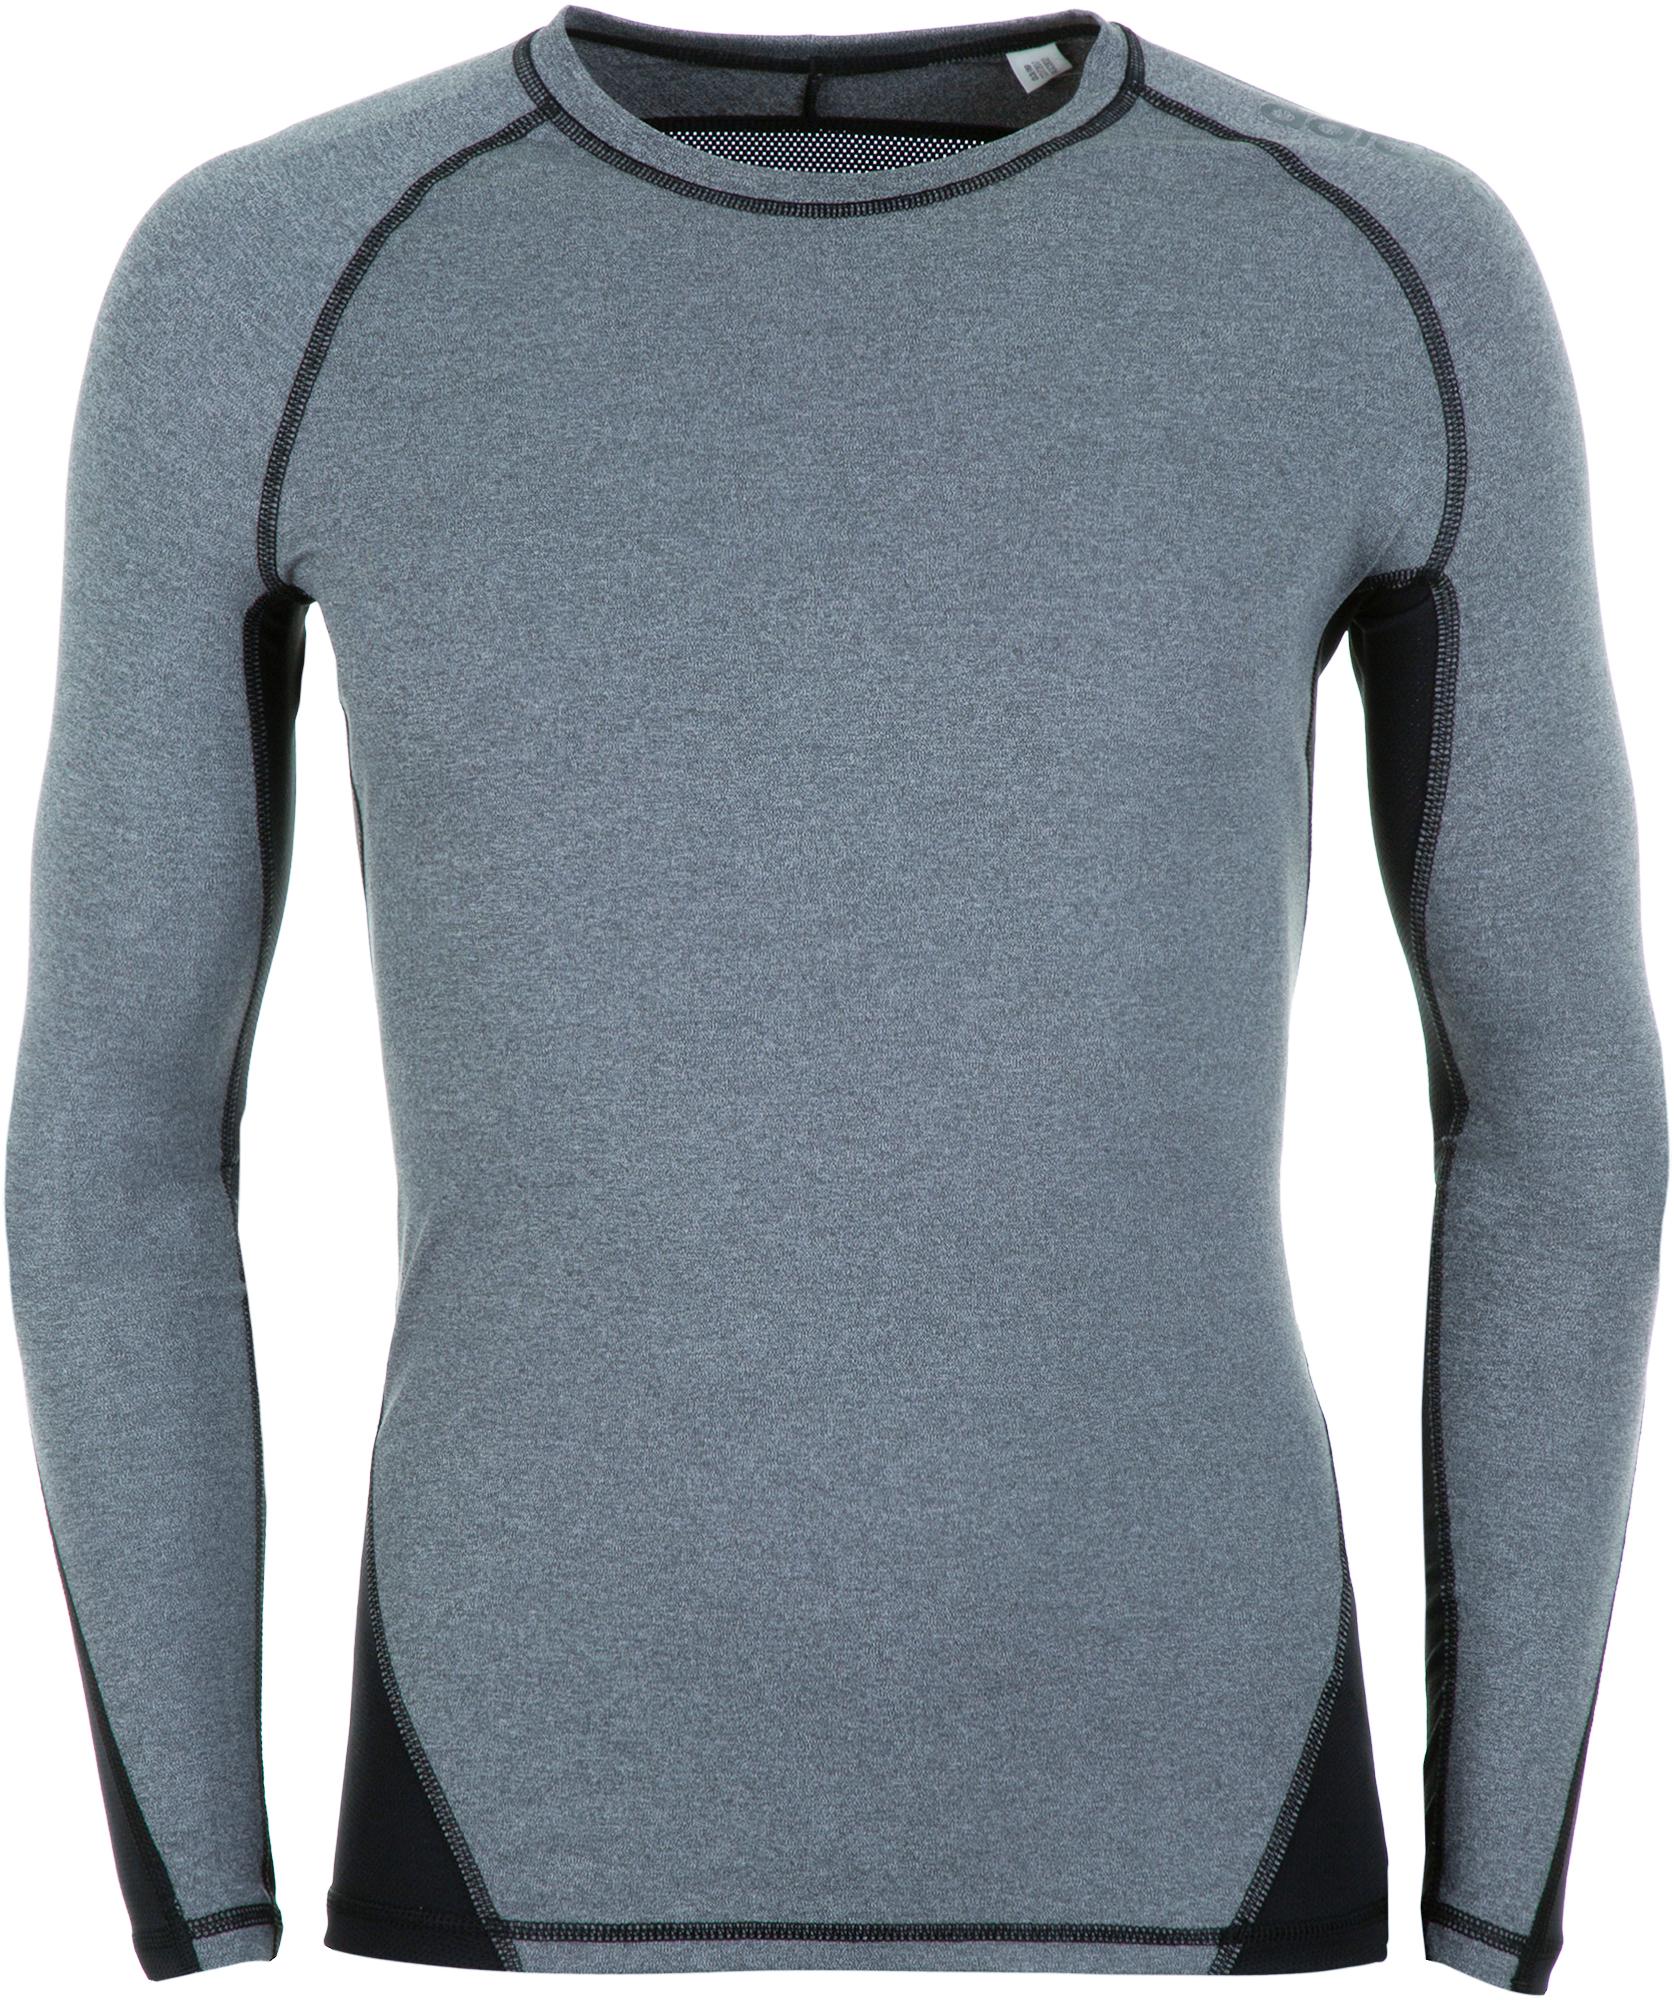 Adidas Лонгслив мужской Adidas Alphaskin Sport Heather, размер 52-54 цена 2017